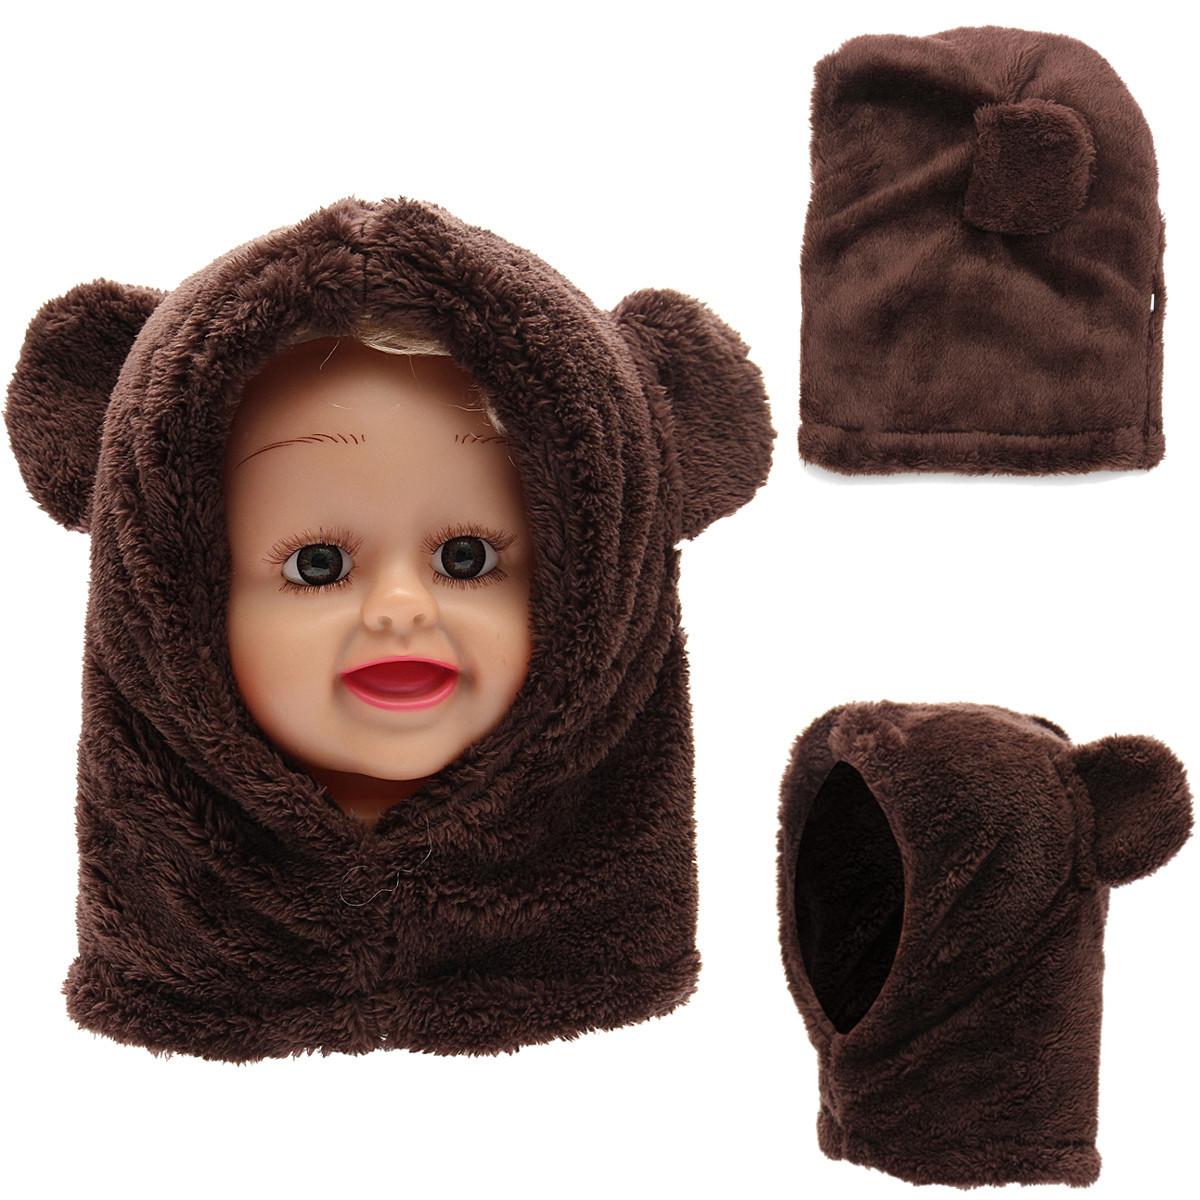 Toddler Boy Girl Baby Kids Cute Warm Winter Fluffy Bear